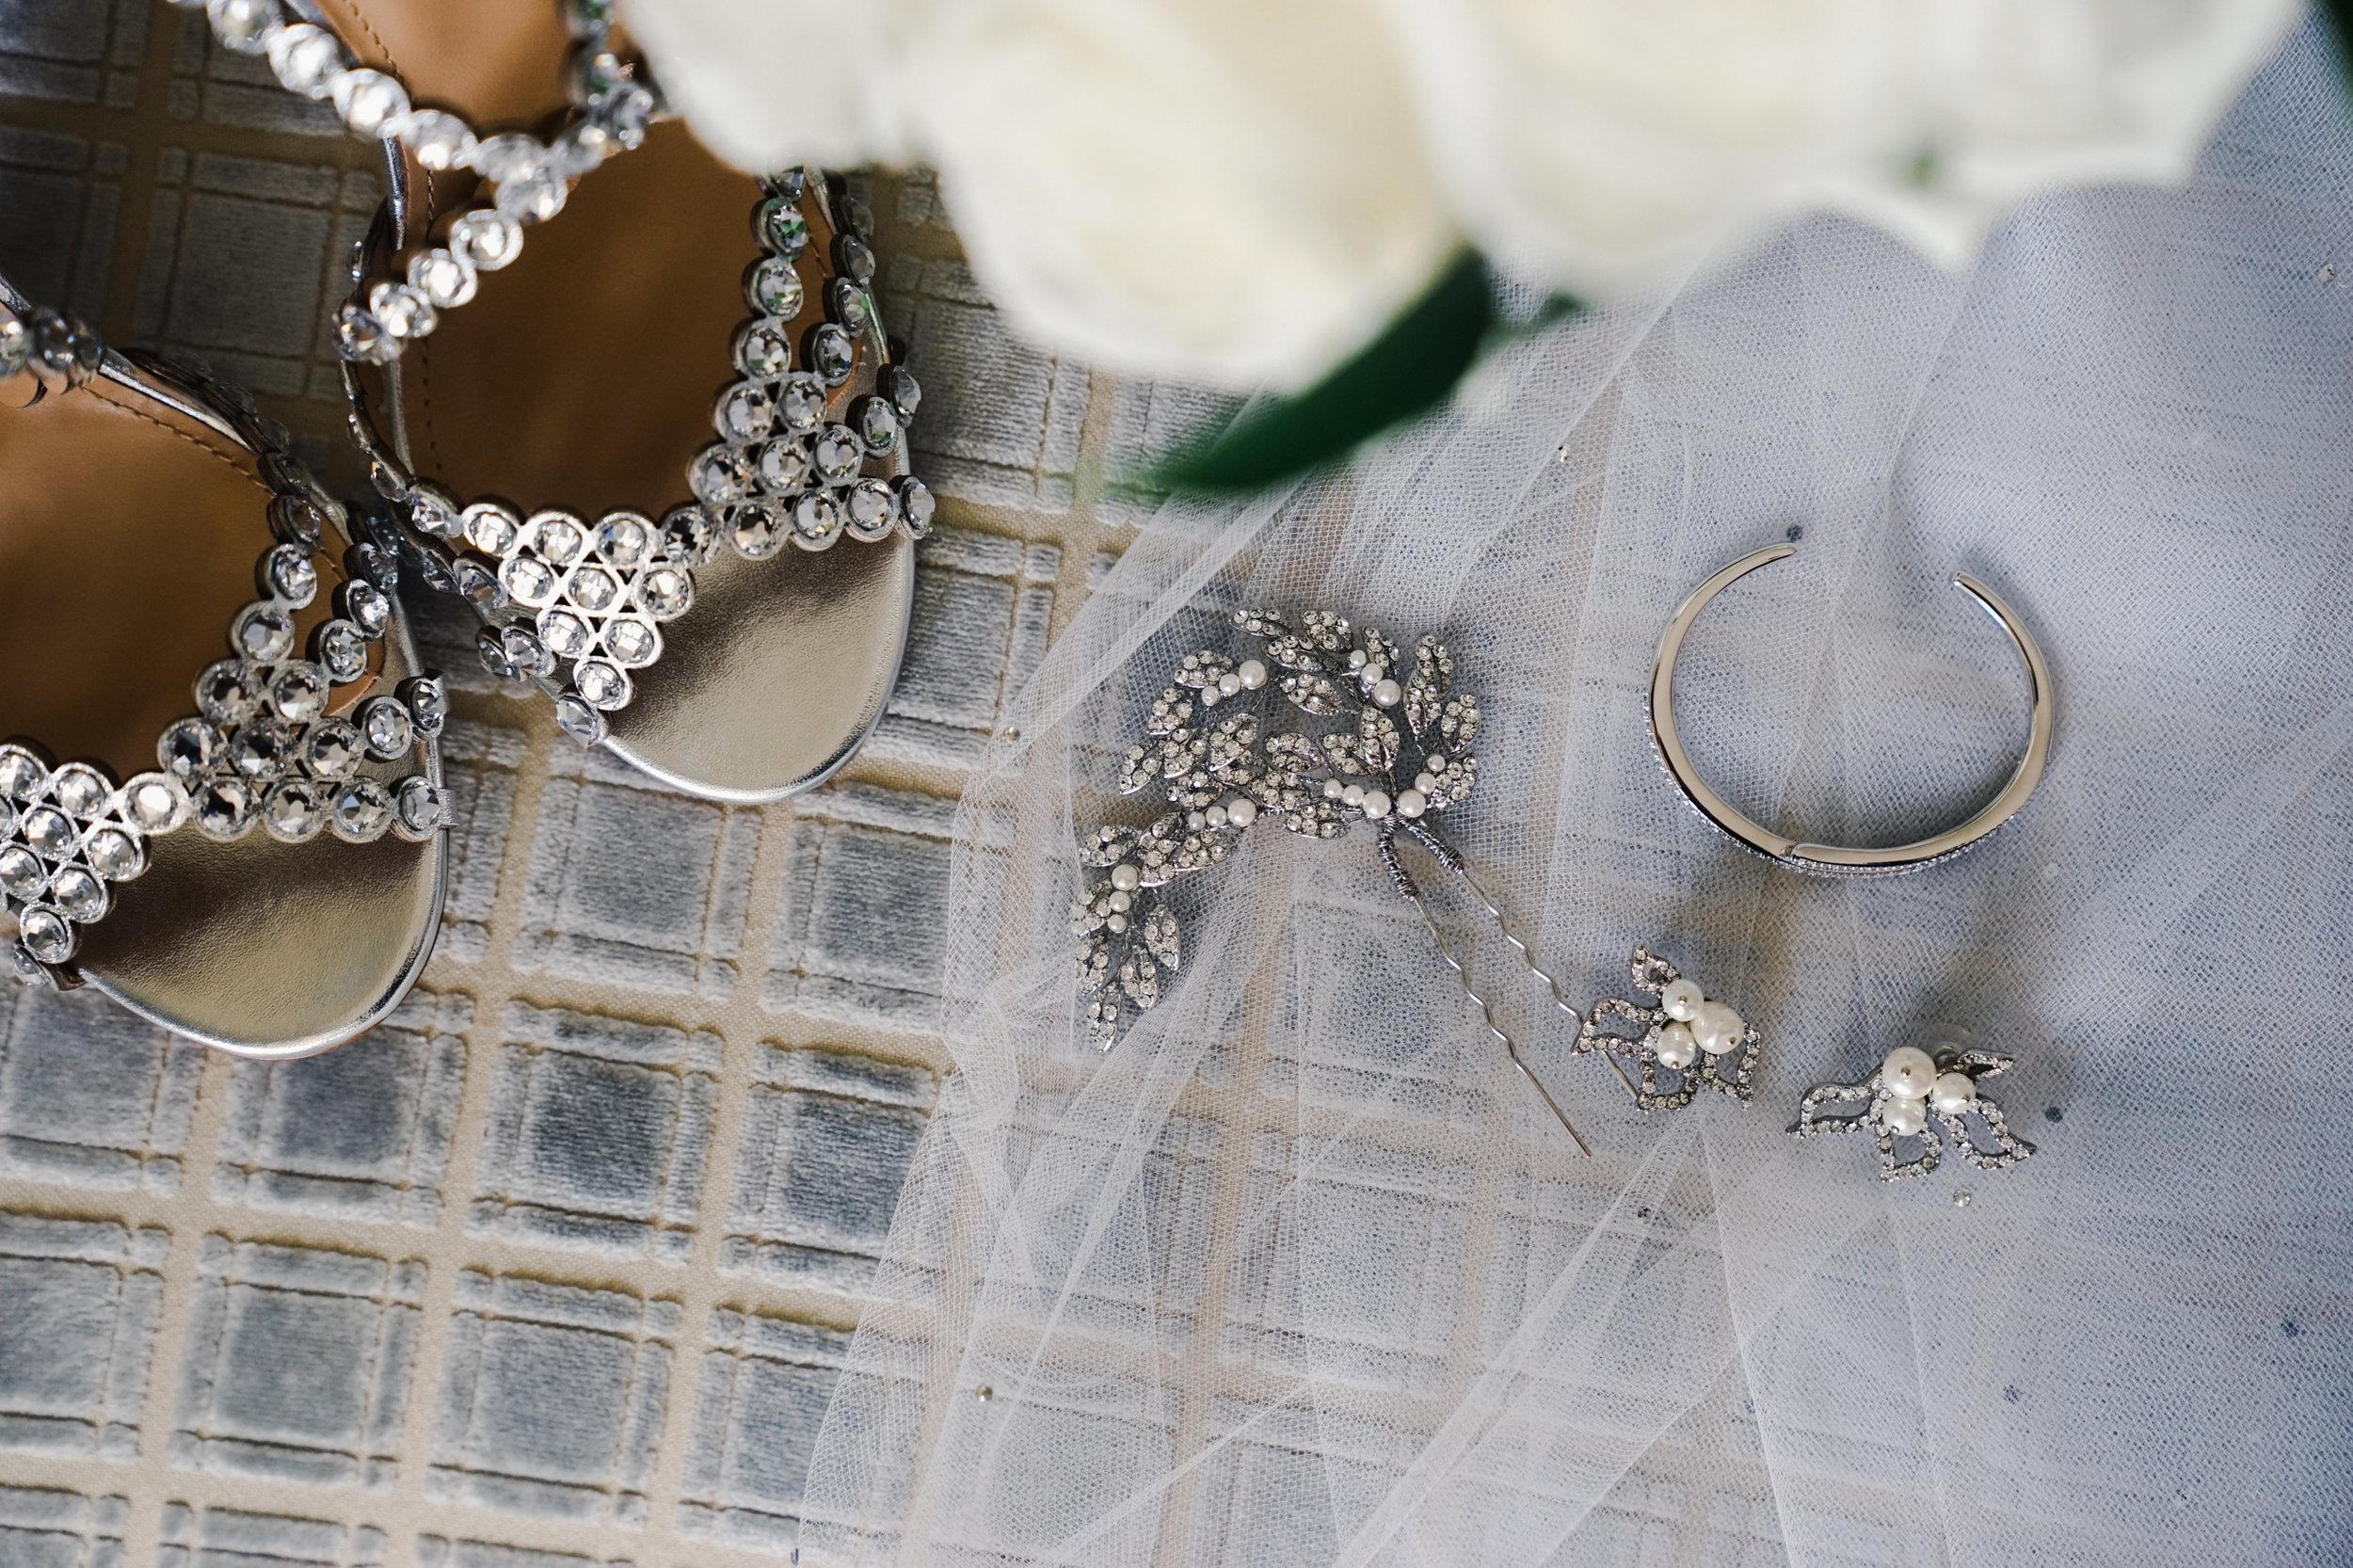 ritz-carlton-laguna-niguel-wedding-sonya_0006.JPG